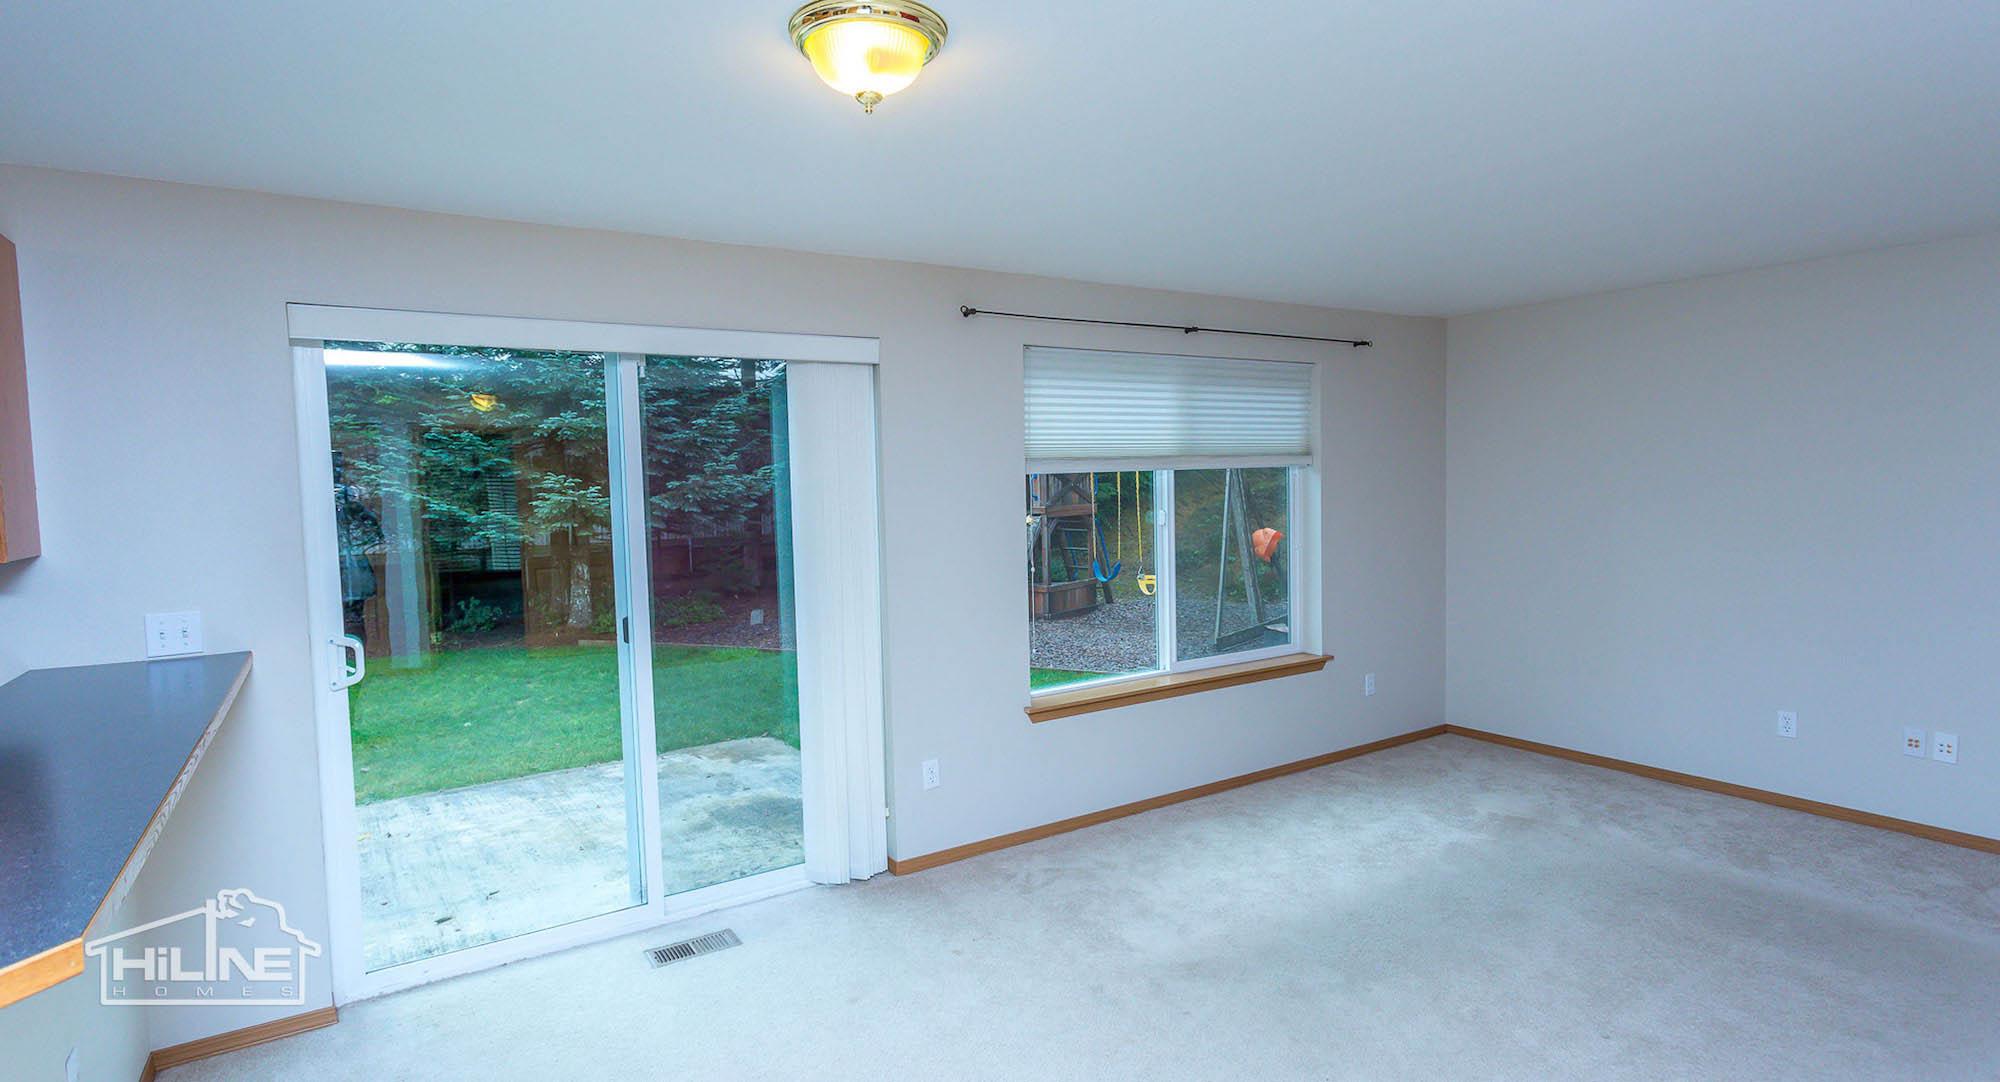 HiLine Home Plan 2345 Living Room